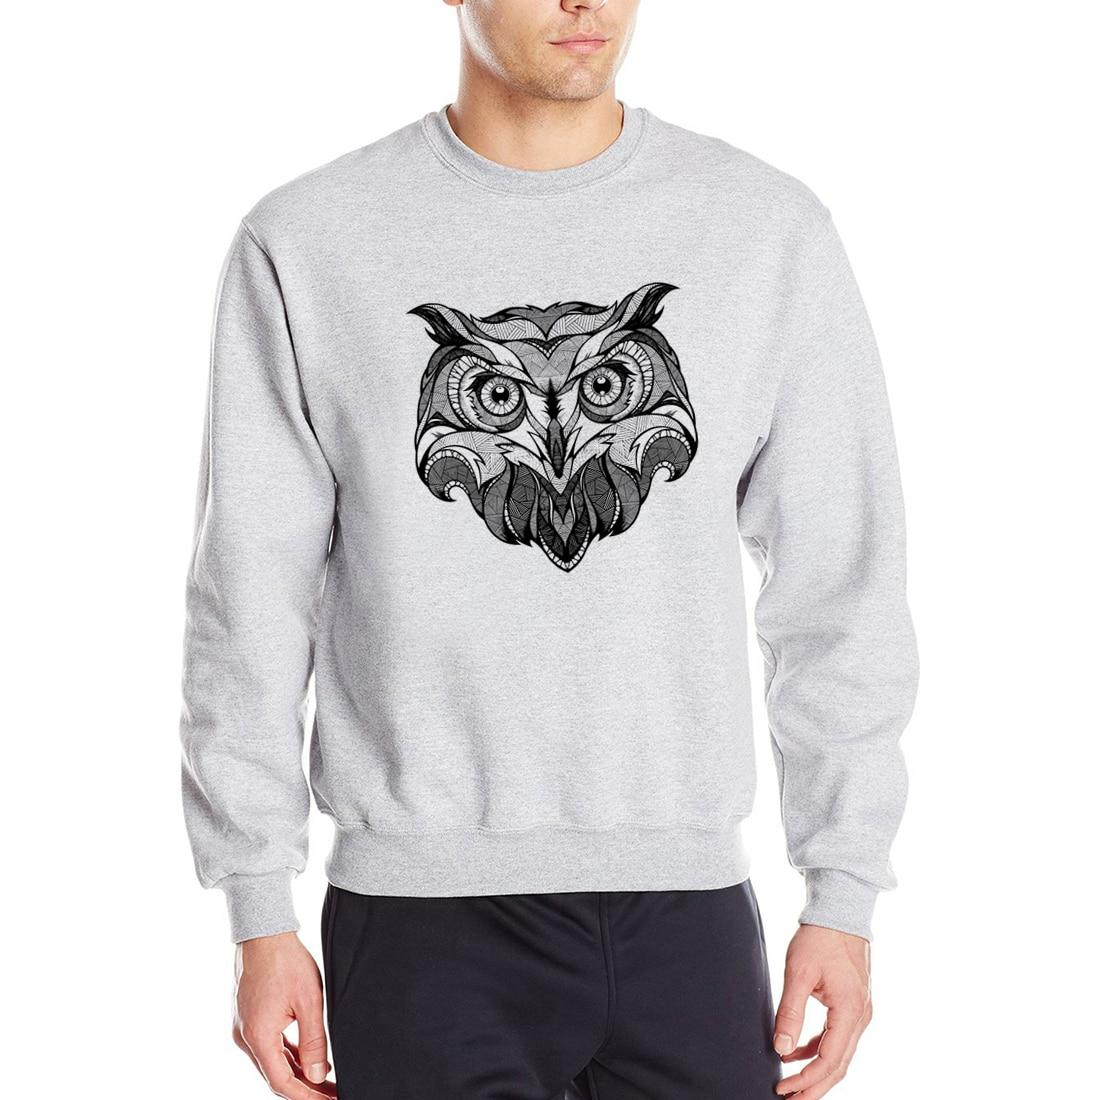 2019 Spring Owl Animal Men Sweatshirts Hoodies Black White Gray Red Blue Sweatshirt Fleece Men's Hoody Hip Hop Streetwear CM01